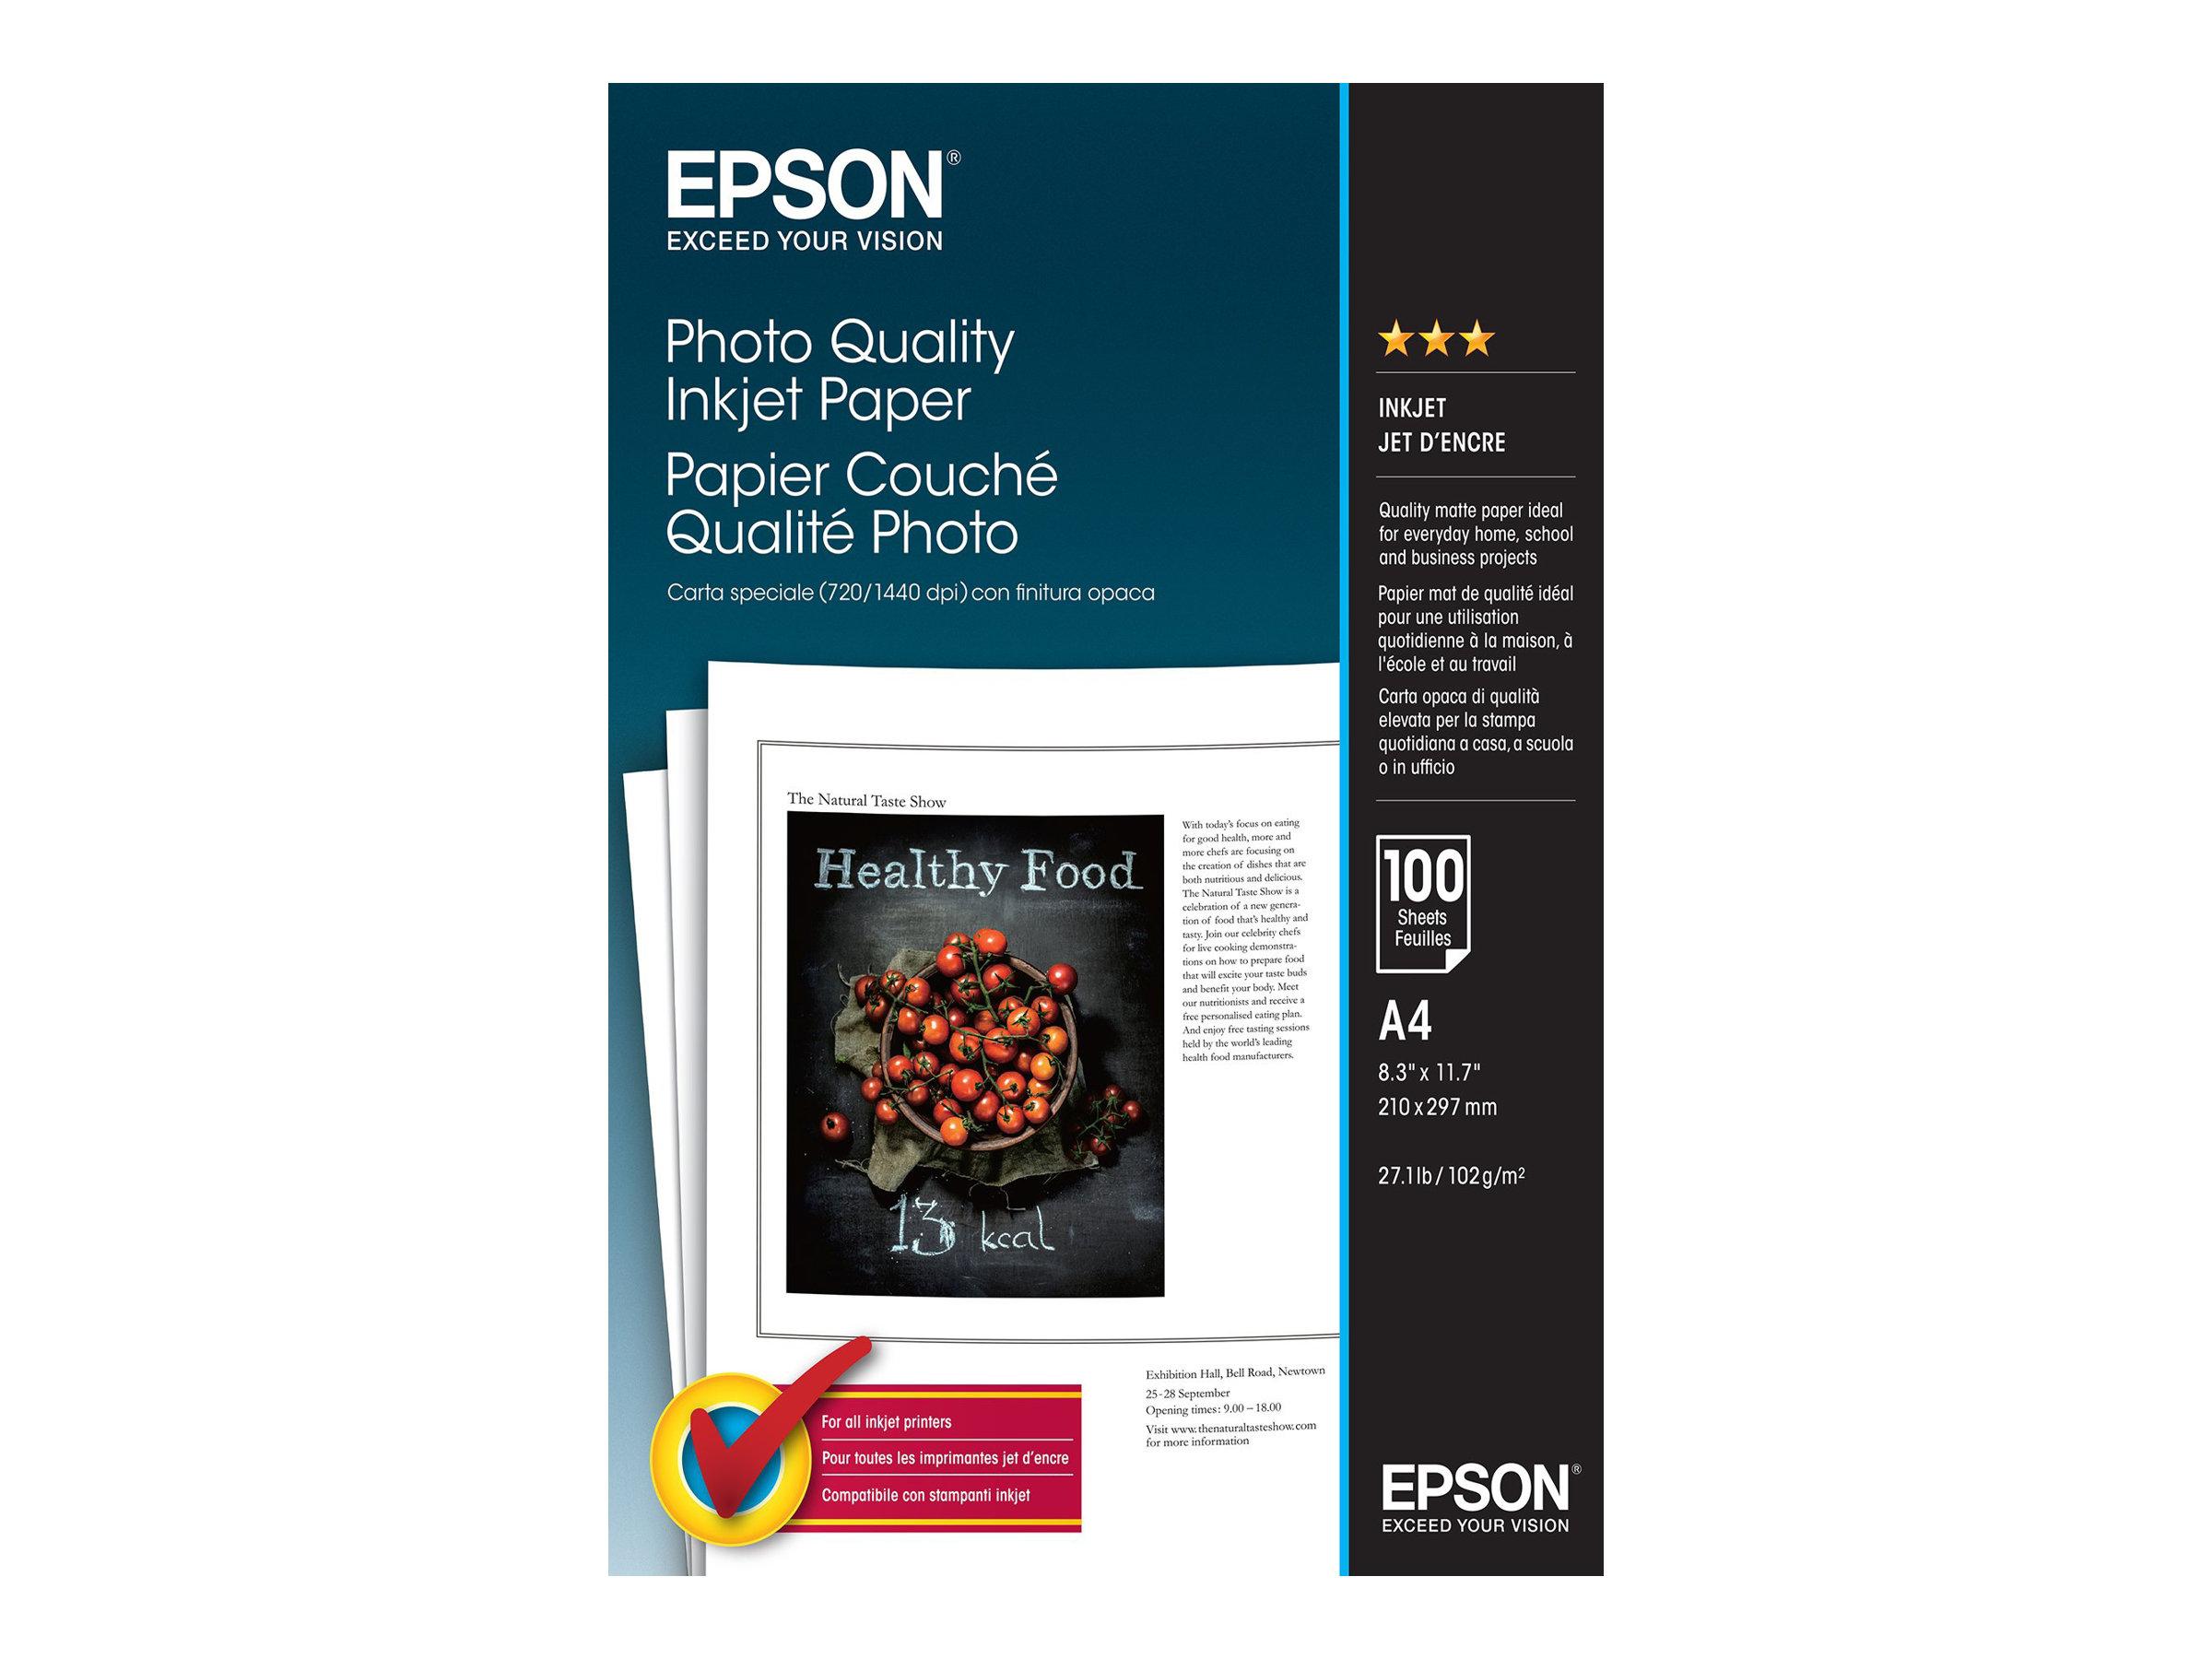 Epson Photo Quality Ink Jet Paper - Matt - beschichtet - Pure White - A4 (210 x 297 mm) - 102 g/m²